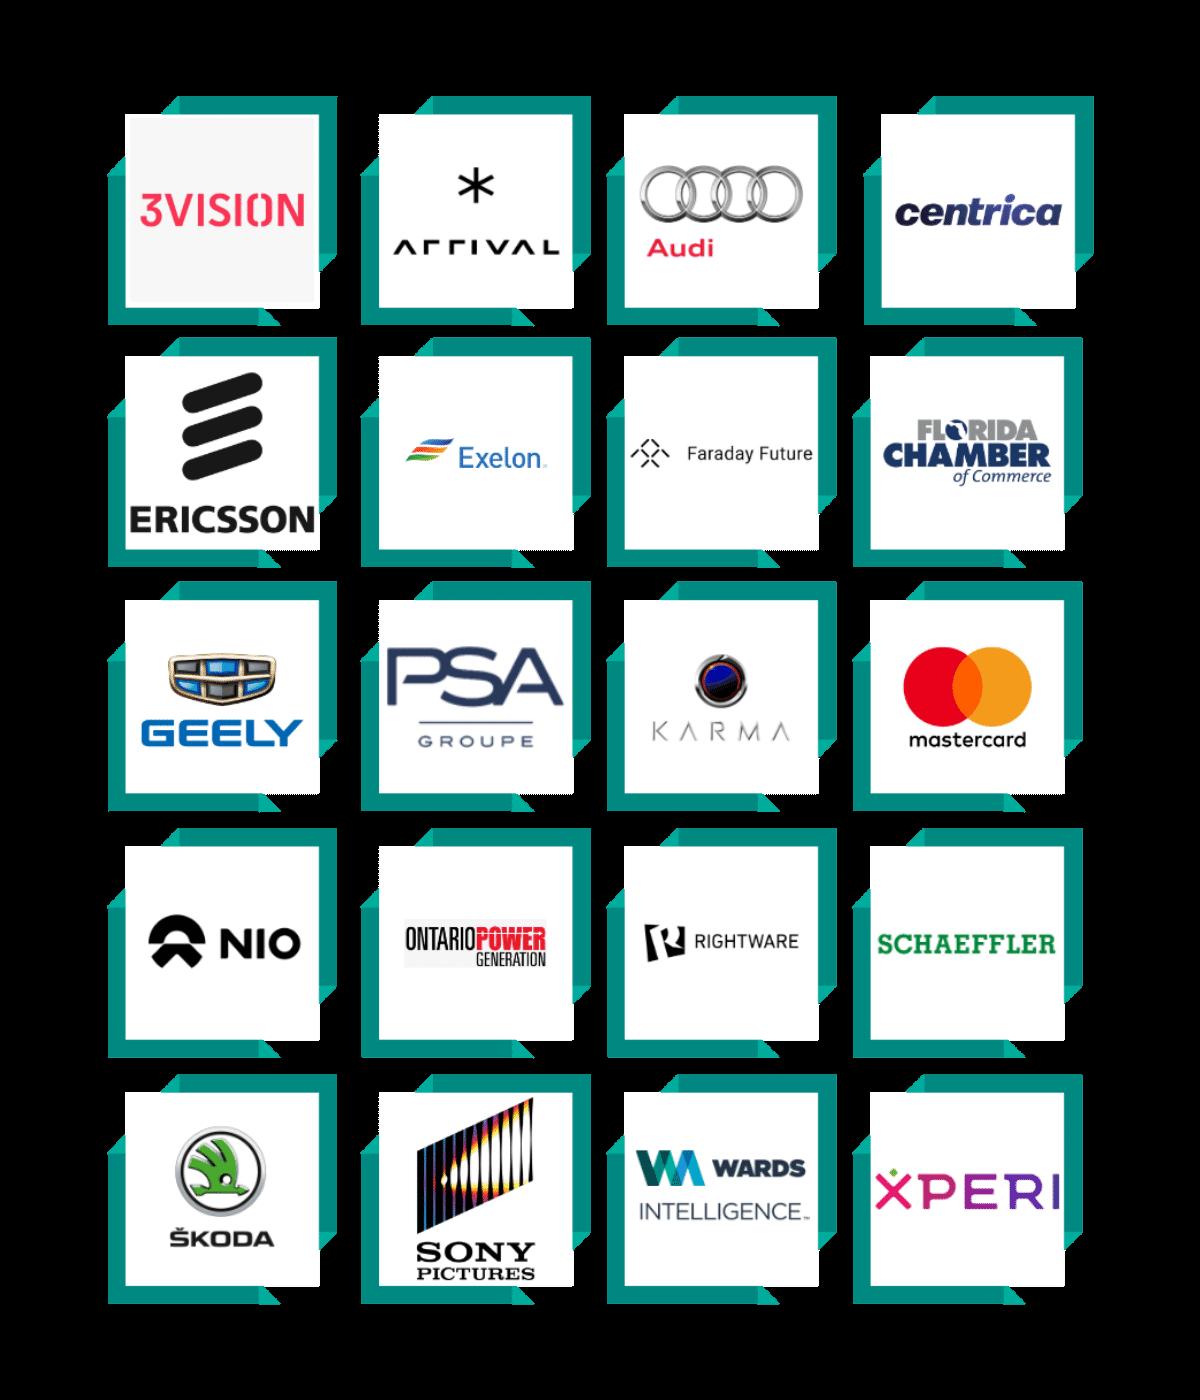 Automotive Tech Week Megatrends speakers